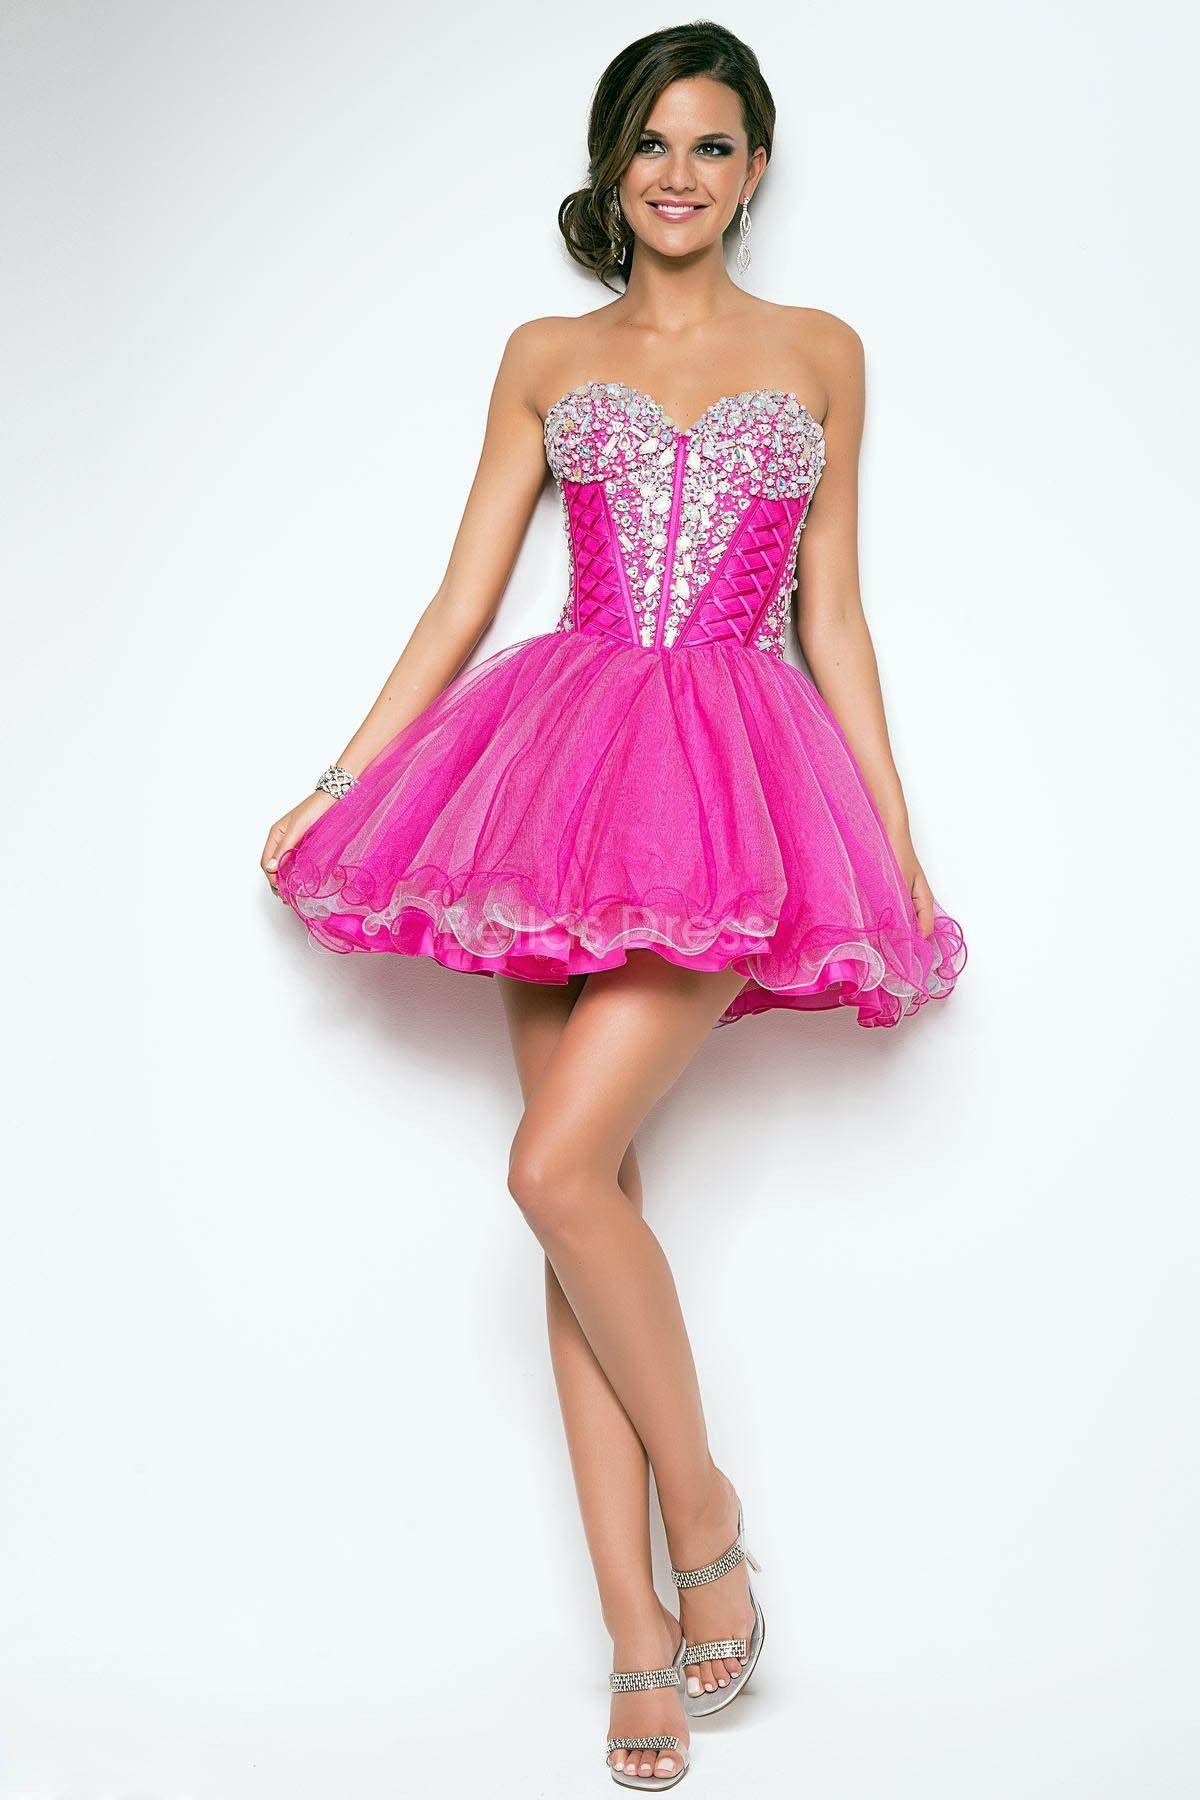 Vestidos para festa neon | Short pink prom dresses, Tulle dress and Prom